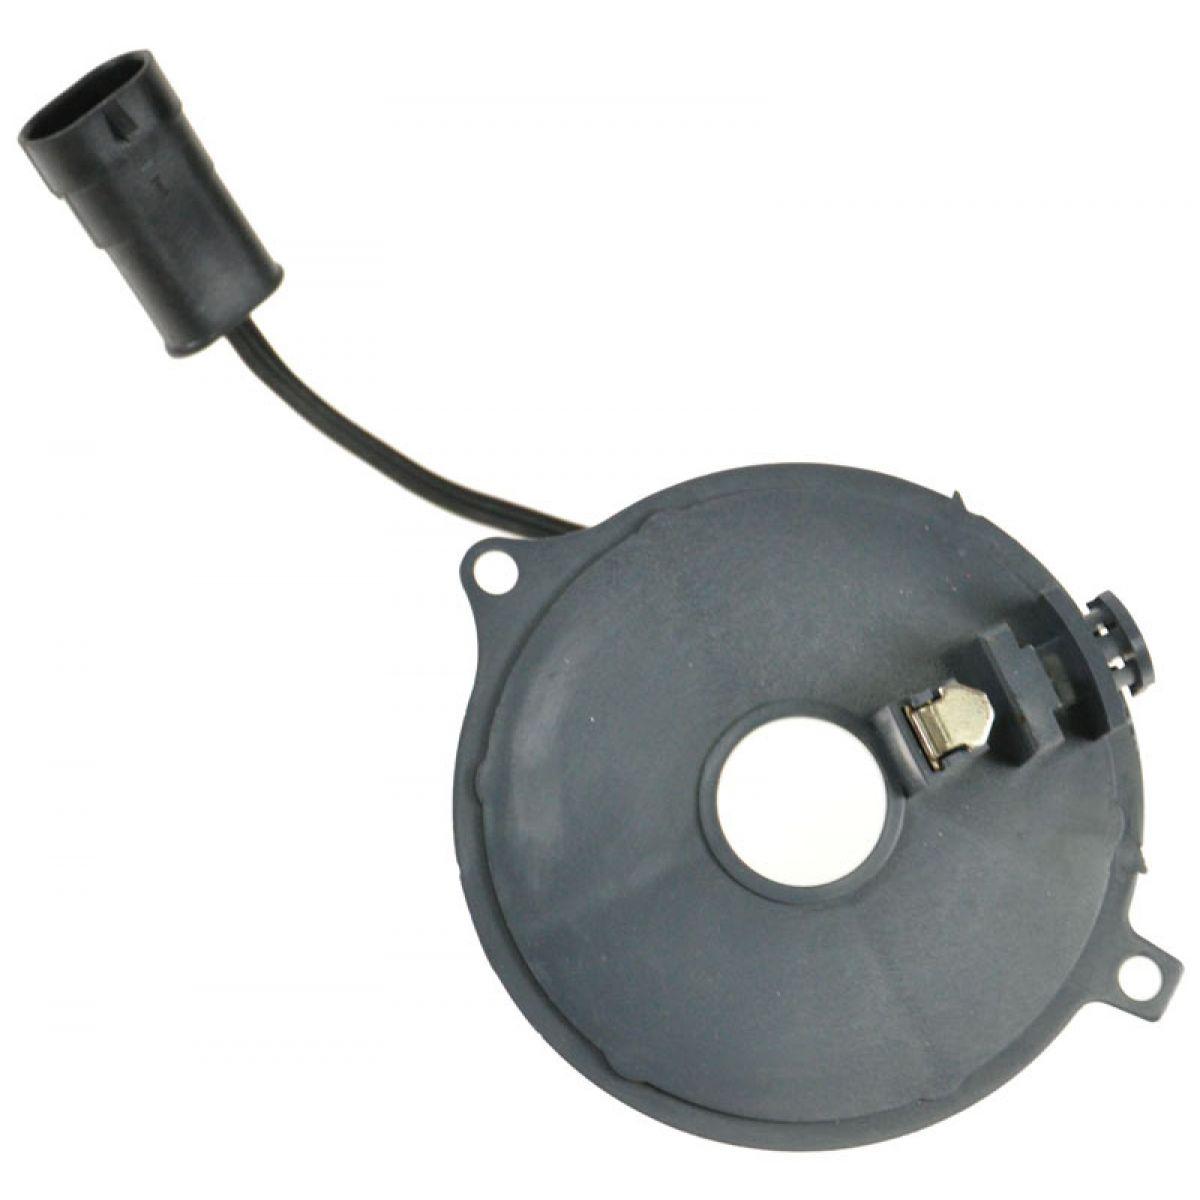 fit Ignition Distributor for Grand Cherokee Wrangler Dakota LX258T,56027023